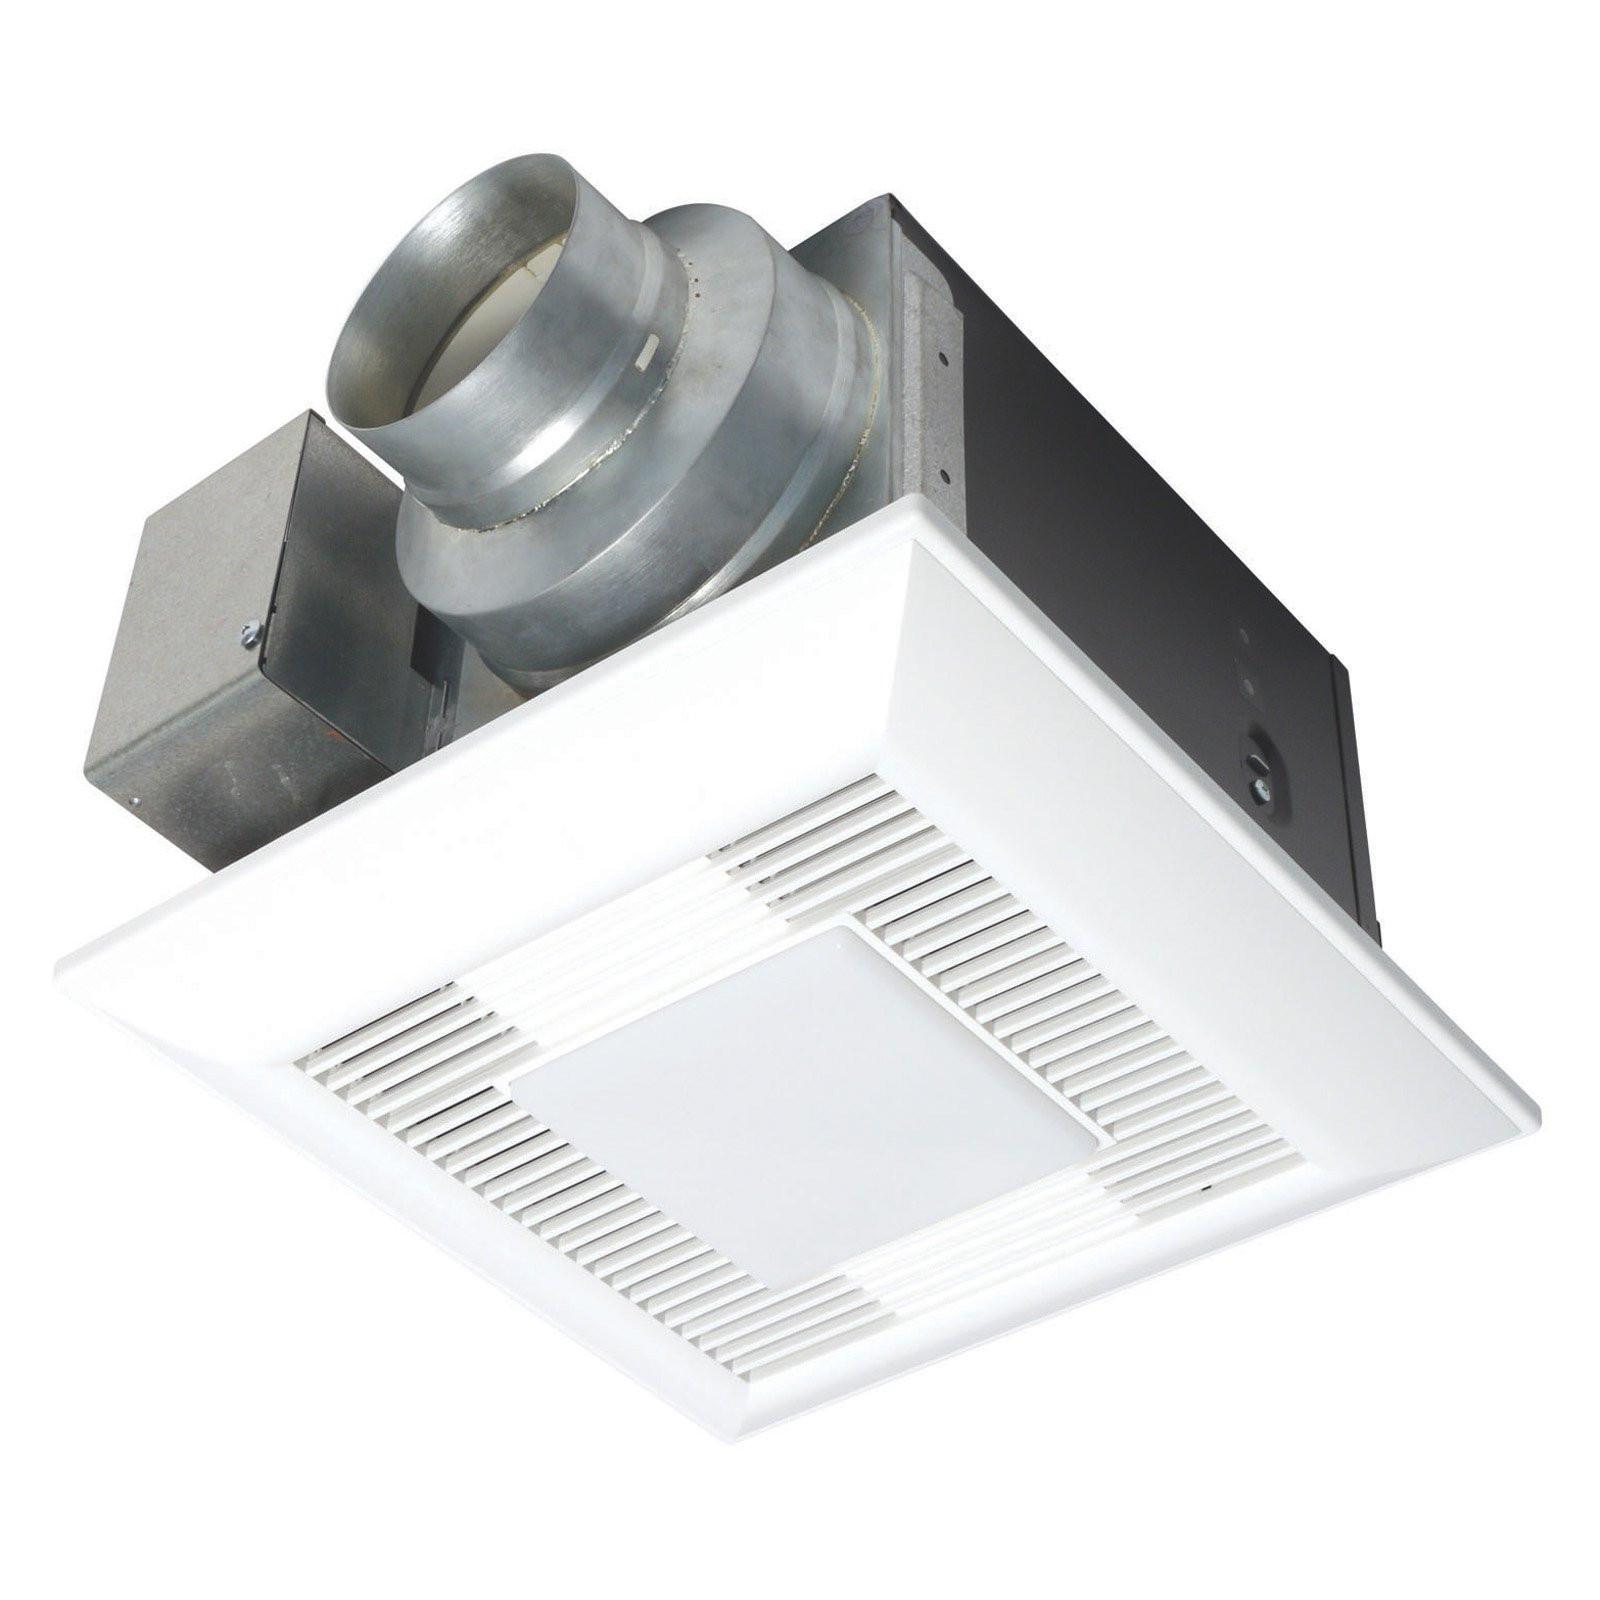 Best ideas about Panasonic Bathroom Fan . Save or Pin Panasonic WhisperLite FV 08VQL5 Ceiling Mount Bathroom Fan Now.